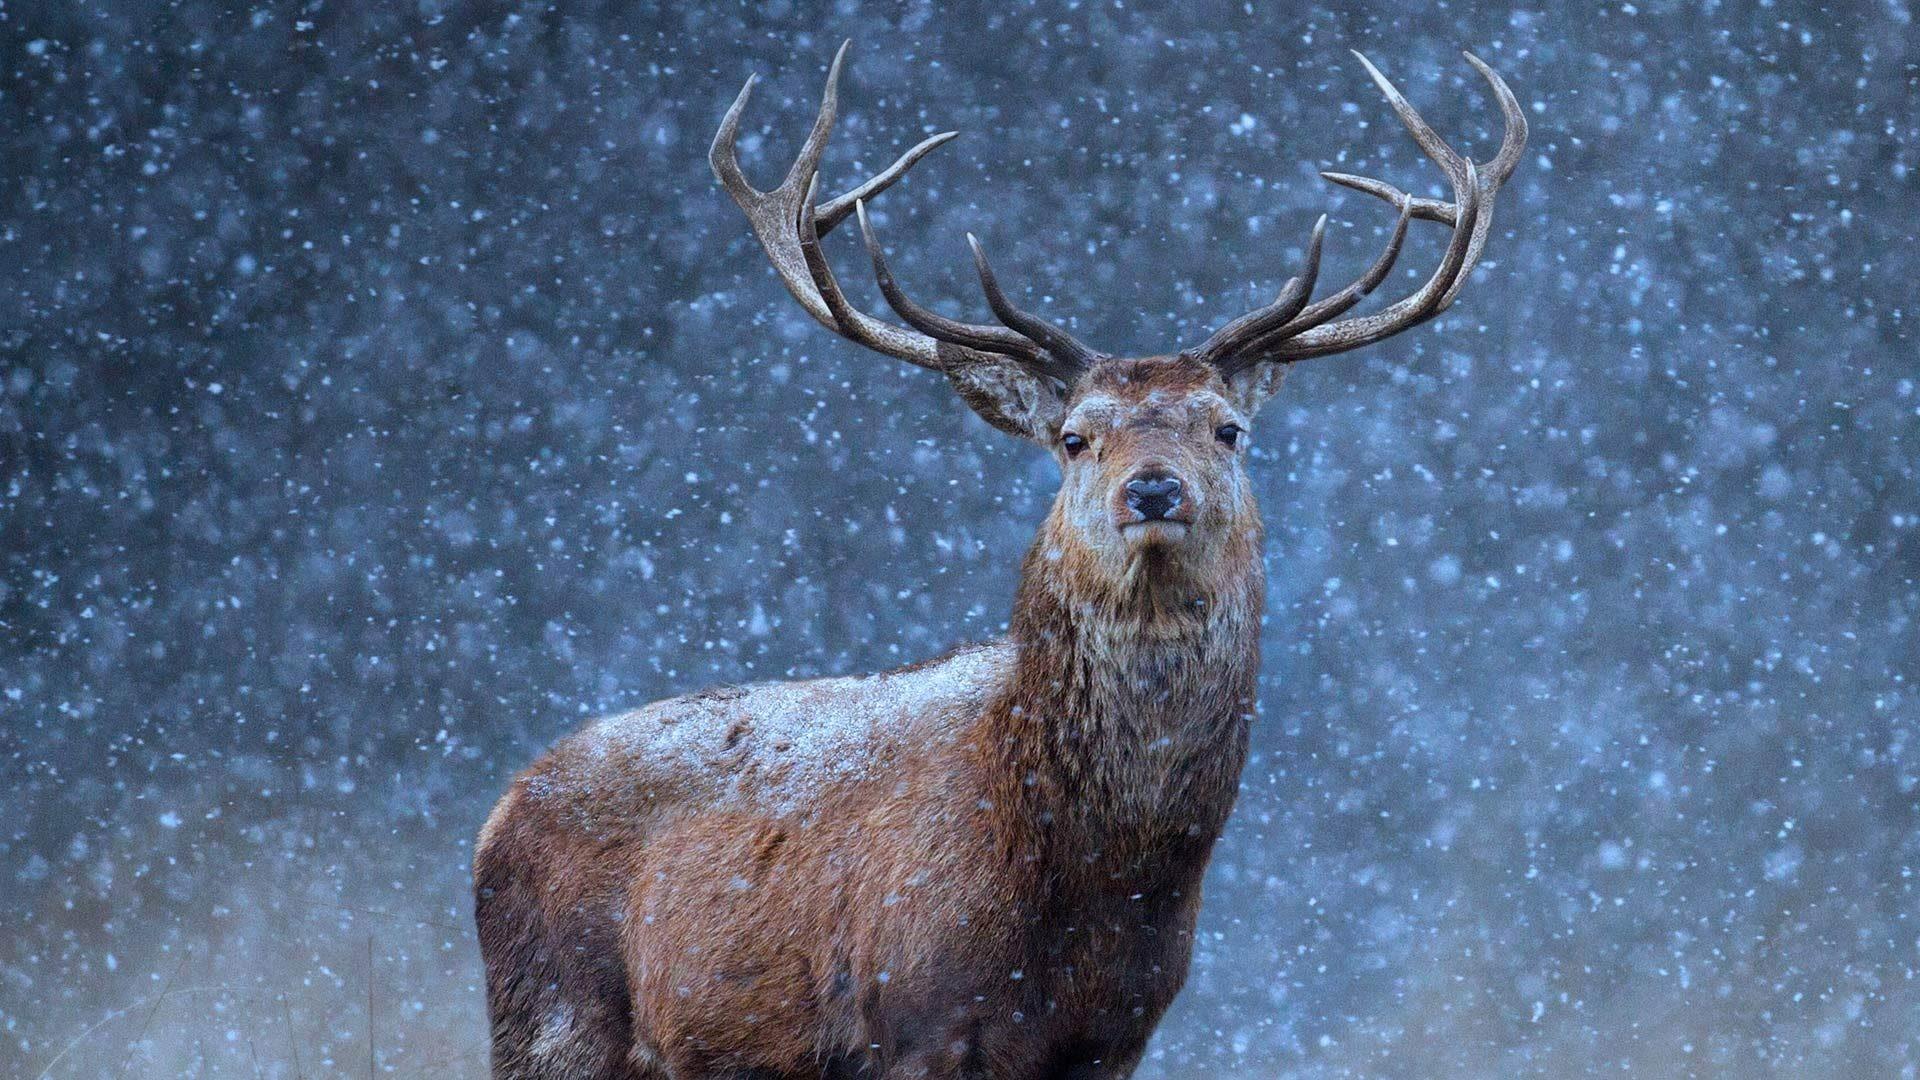 Image: Beautiful Deer in Snow Desktop Wallpaper